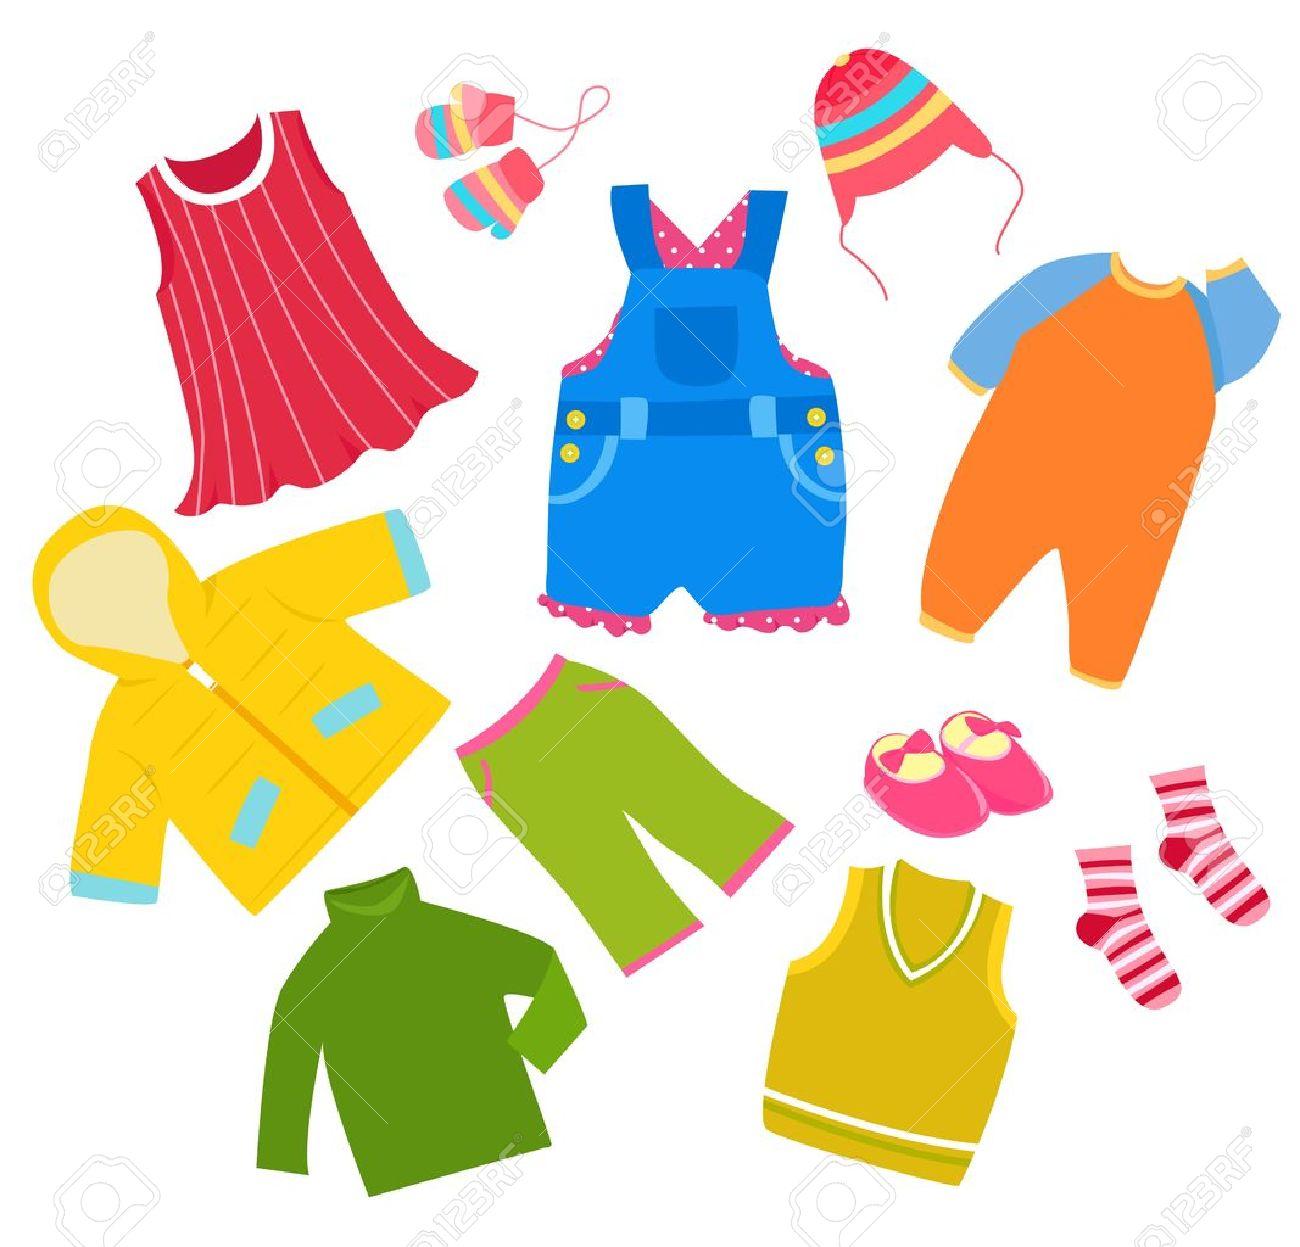 kid clothes frame royalty free cliparts vectors and stock rh 123rf com Boys' Clothes Clip Art Girl Clip Art Clothes